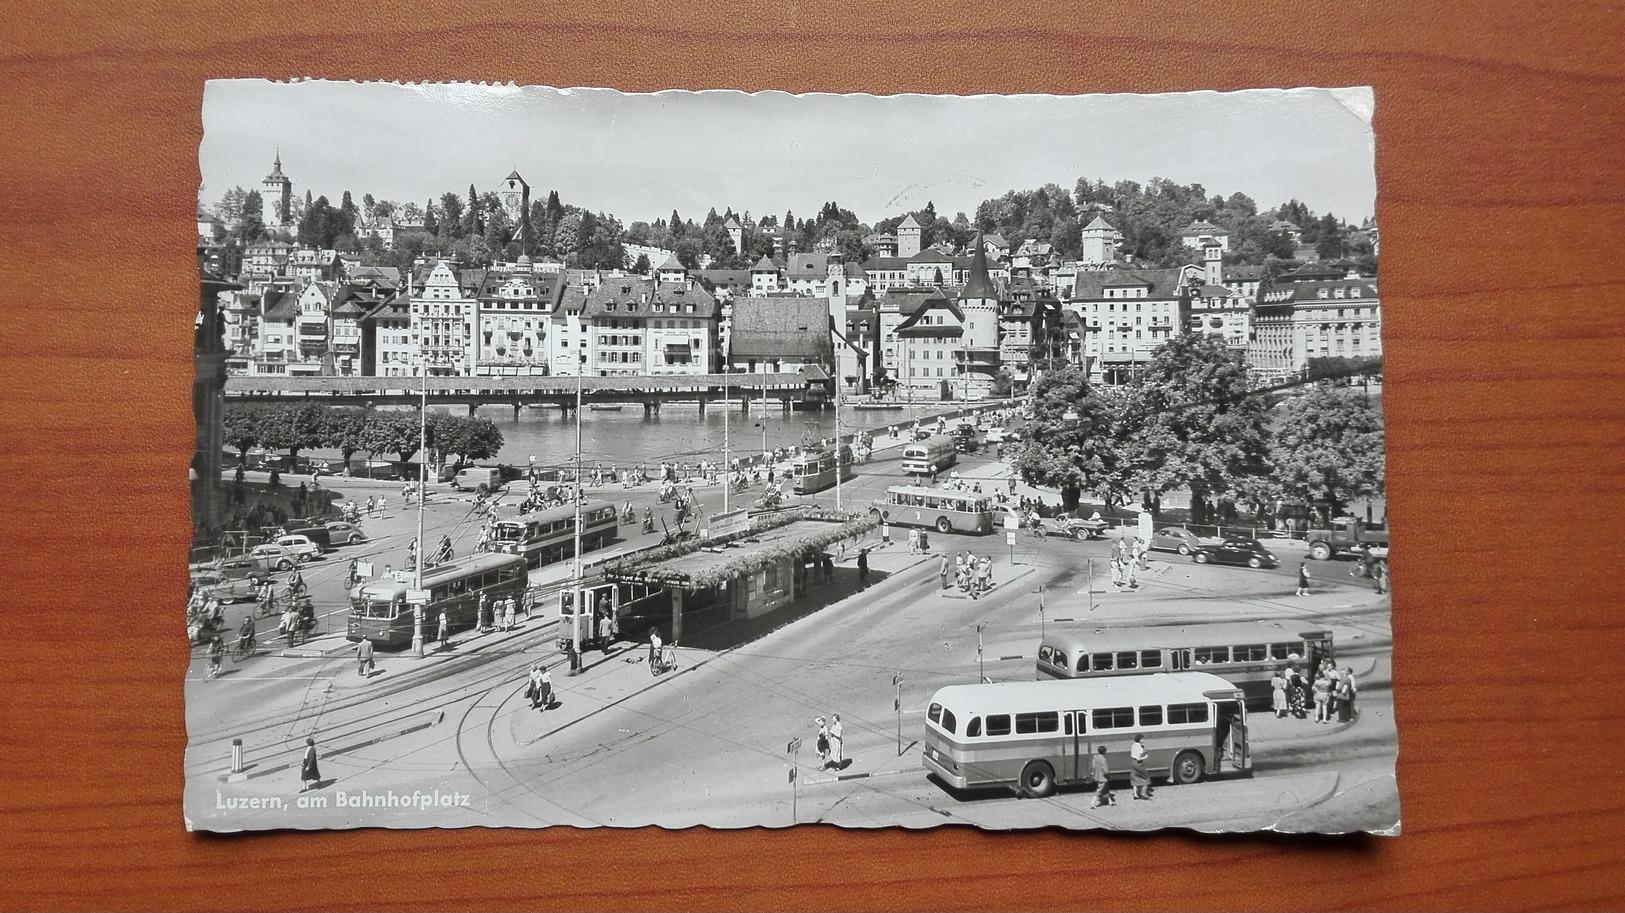 Luzern , Am Bahnhofplatz - LU Lucerne